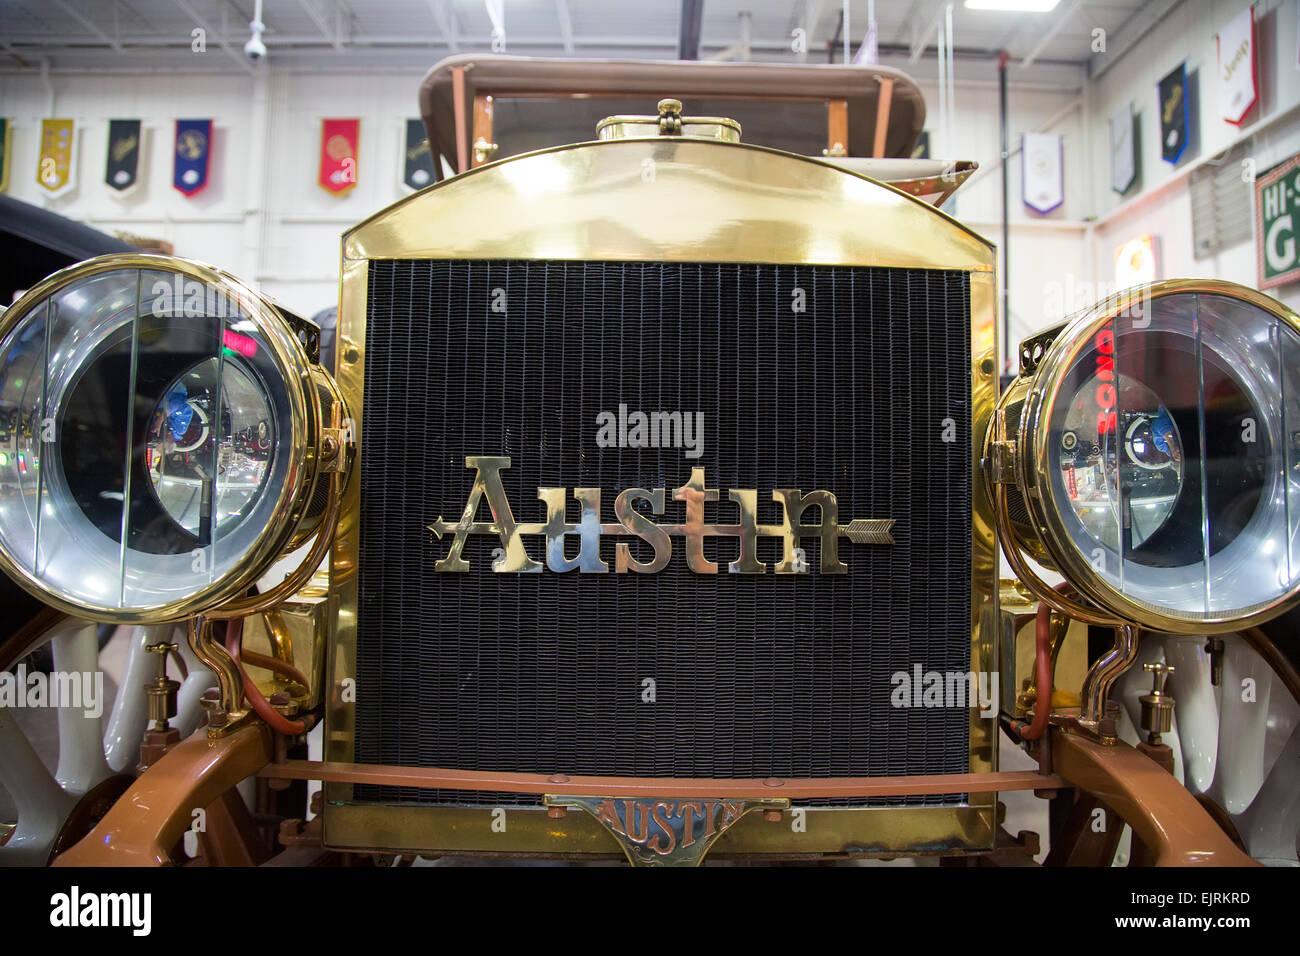 Chesterfield Twp., Michigan - 1909 Austin auf dem Display an Stahl Automotive-Stiftung. Stockbild